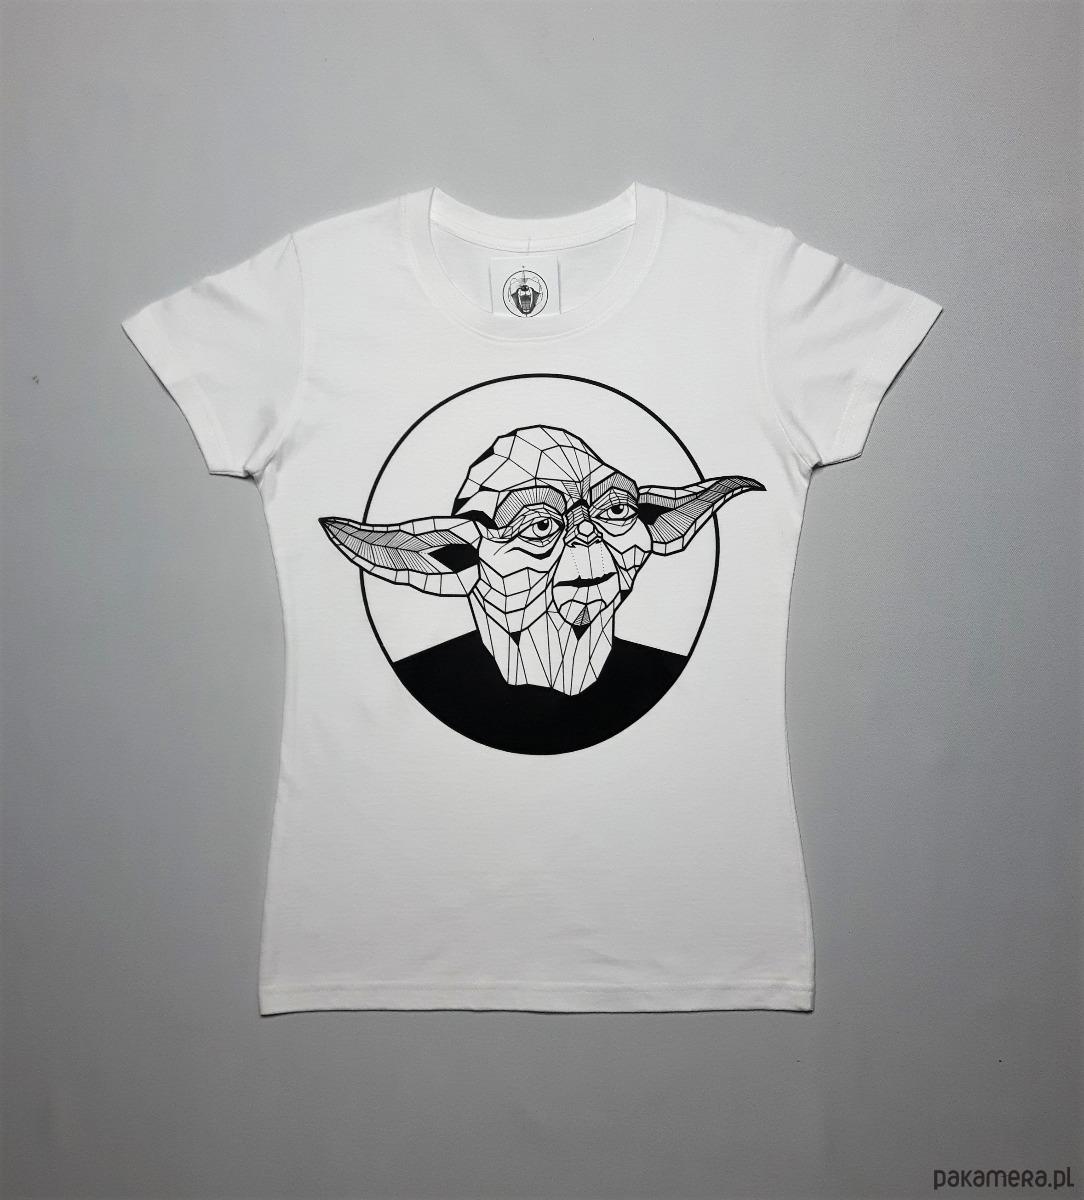 koszulka damska biała Mistrz